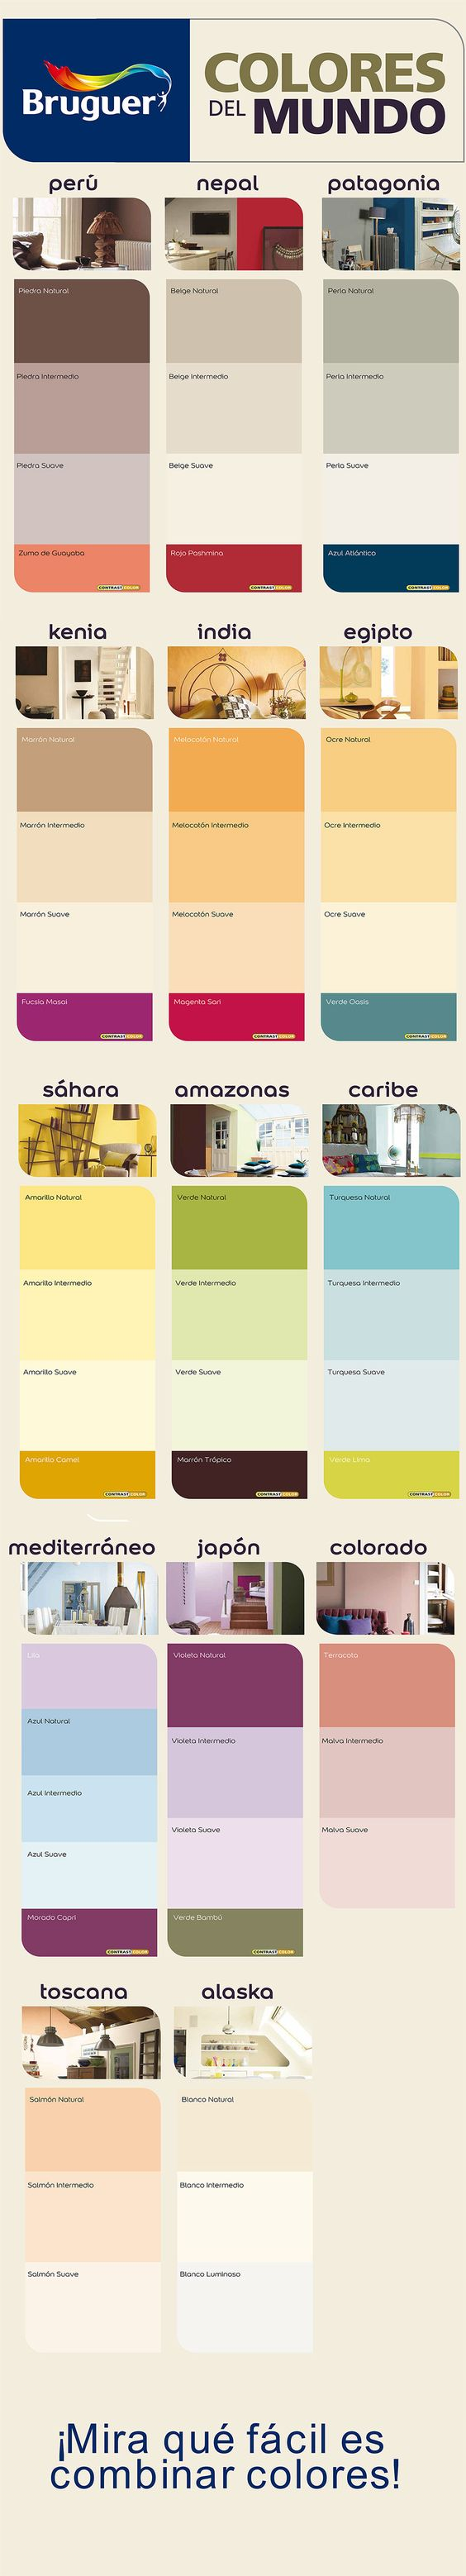 Carta de colores colores del mundo bruguer paleta de - Paleta de colores titanlux ...